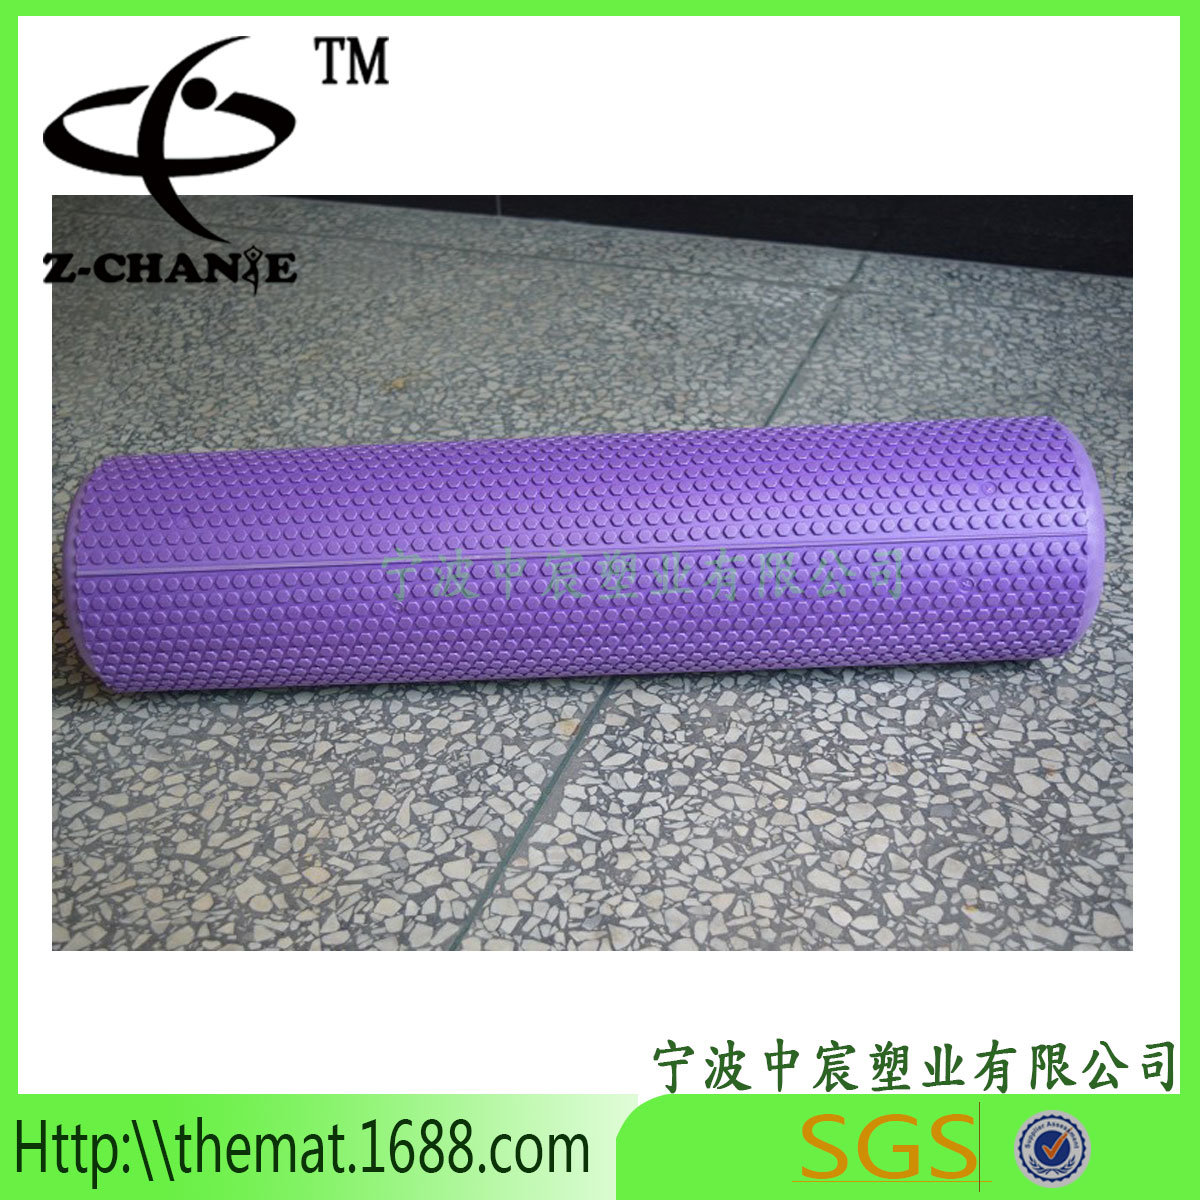 EVA Yoga Pilates Massage Exercise Gym Fitness Foam Roller